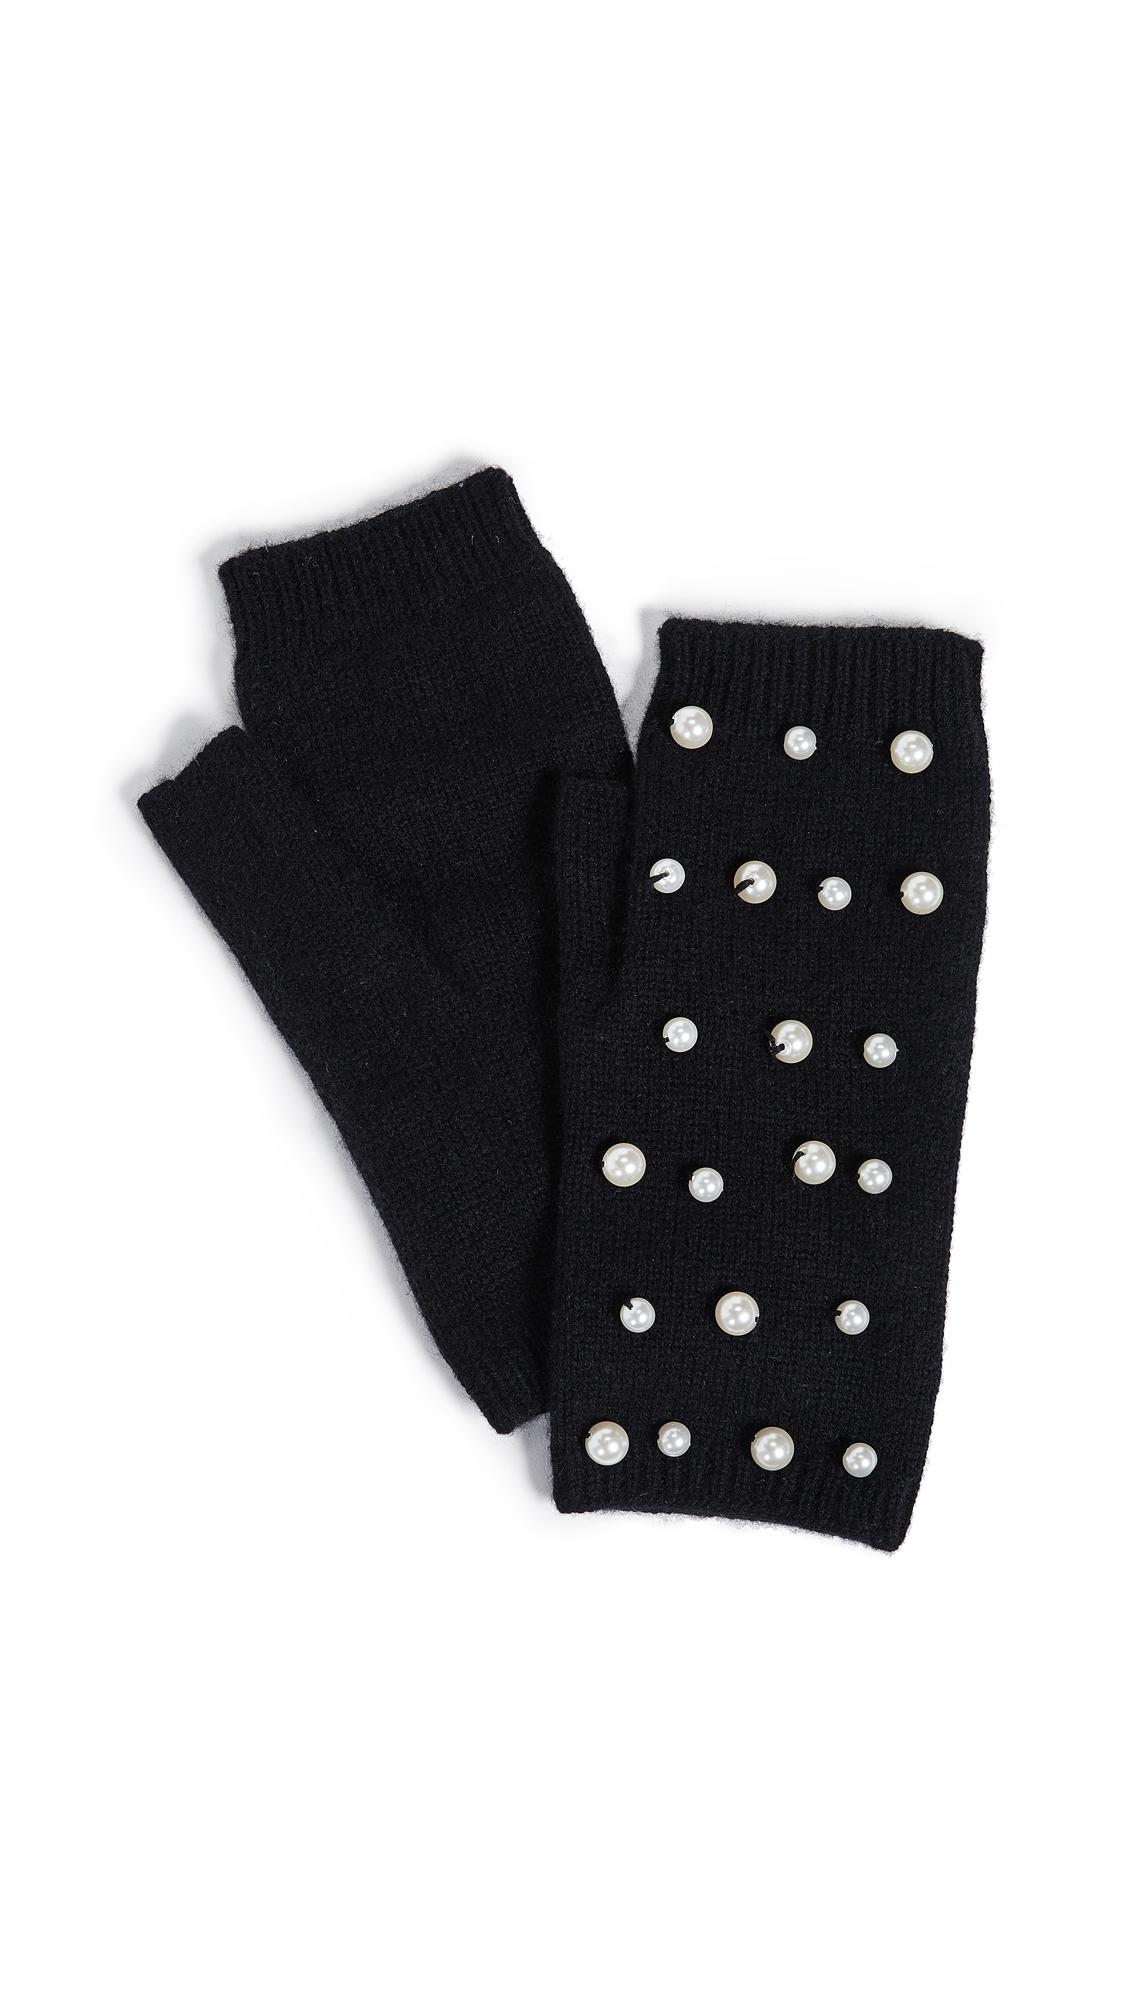 CAROLINA AMATO Imitation Pearl Fingerless Gloves in Black